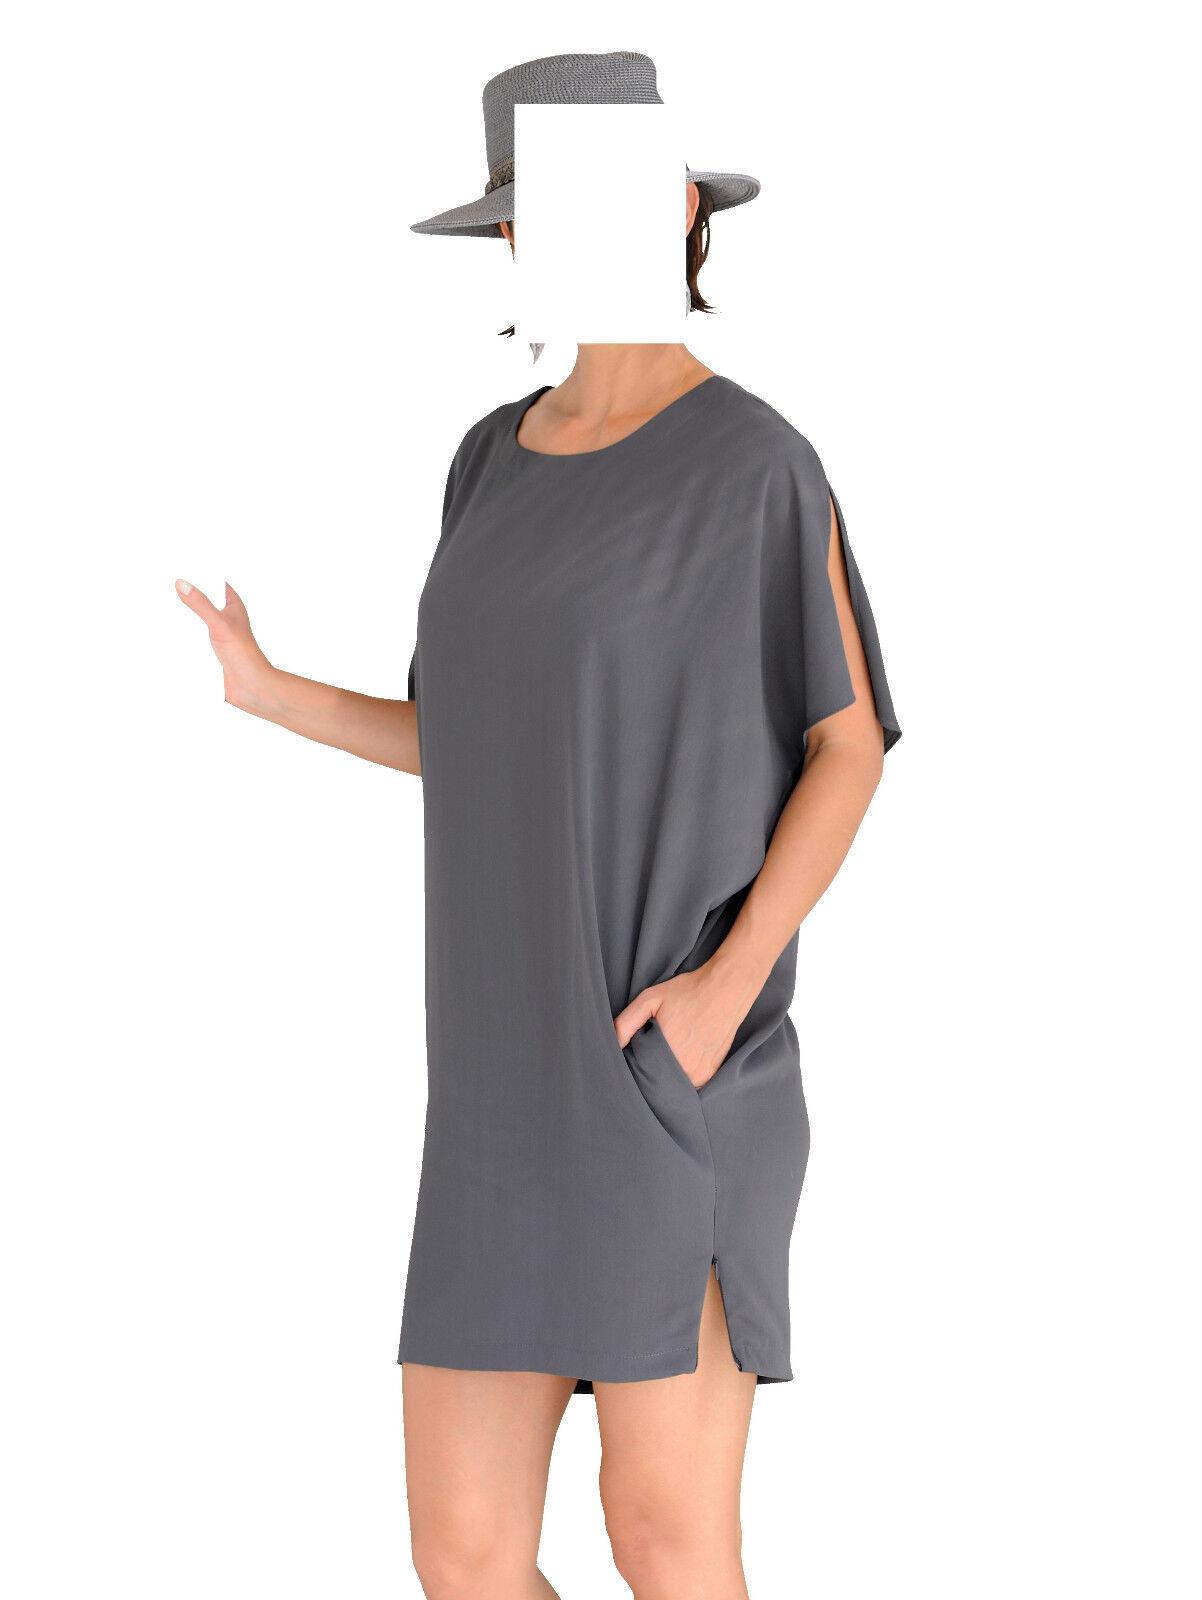 Marken Oversized-Kleid grey  Gr. 48 0318514752